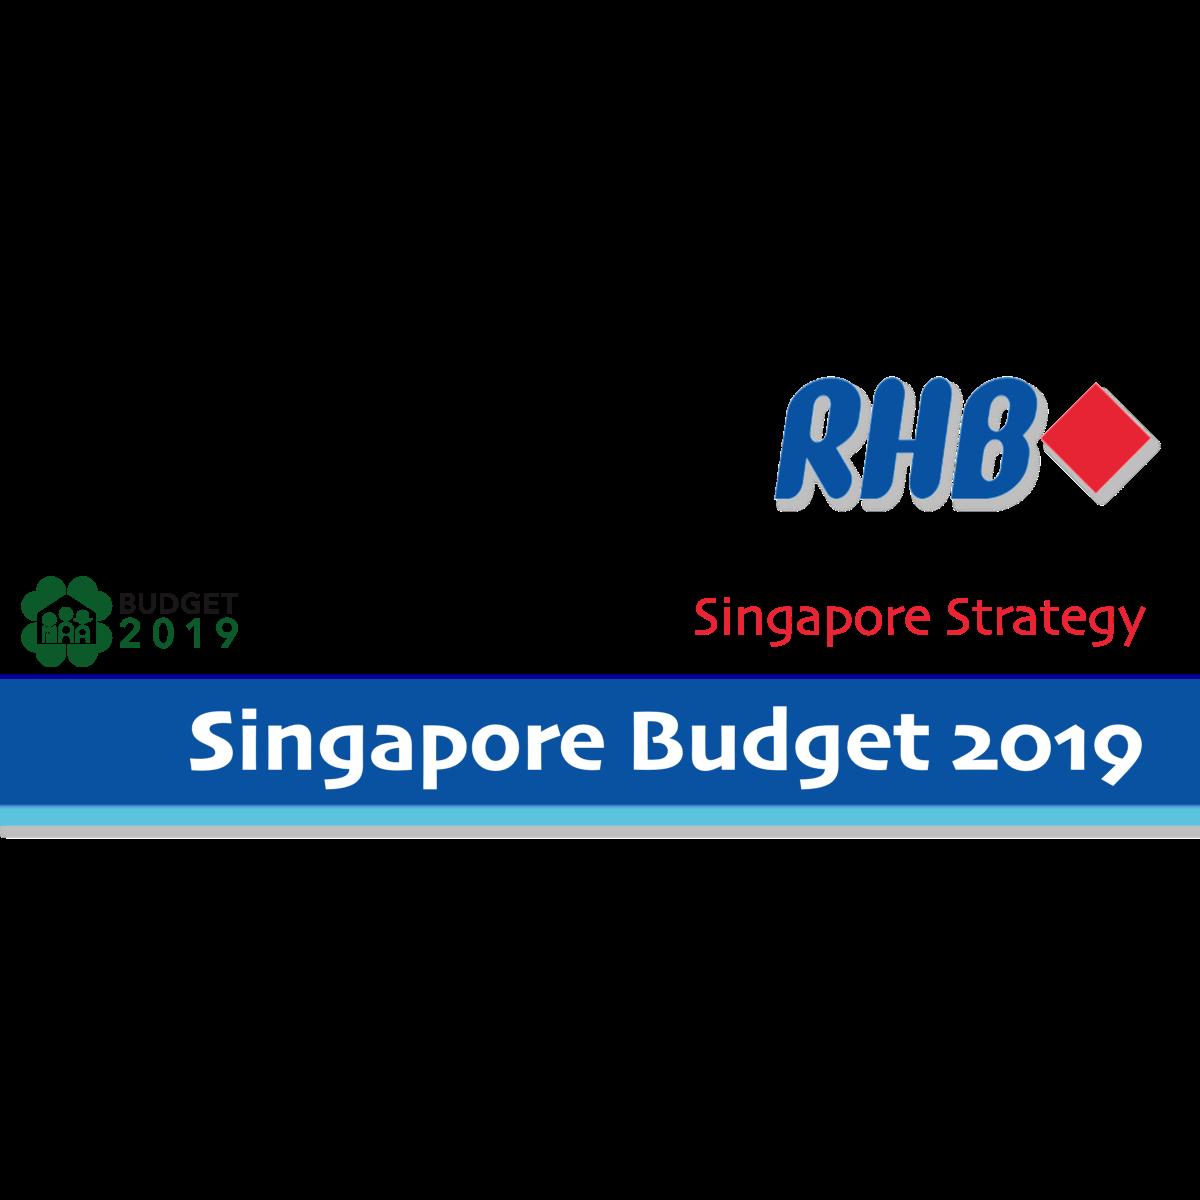 2019 Singapore Budget - RHB Invest Research | SGinvestors.io